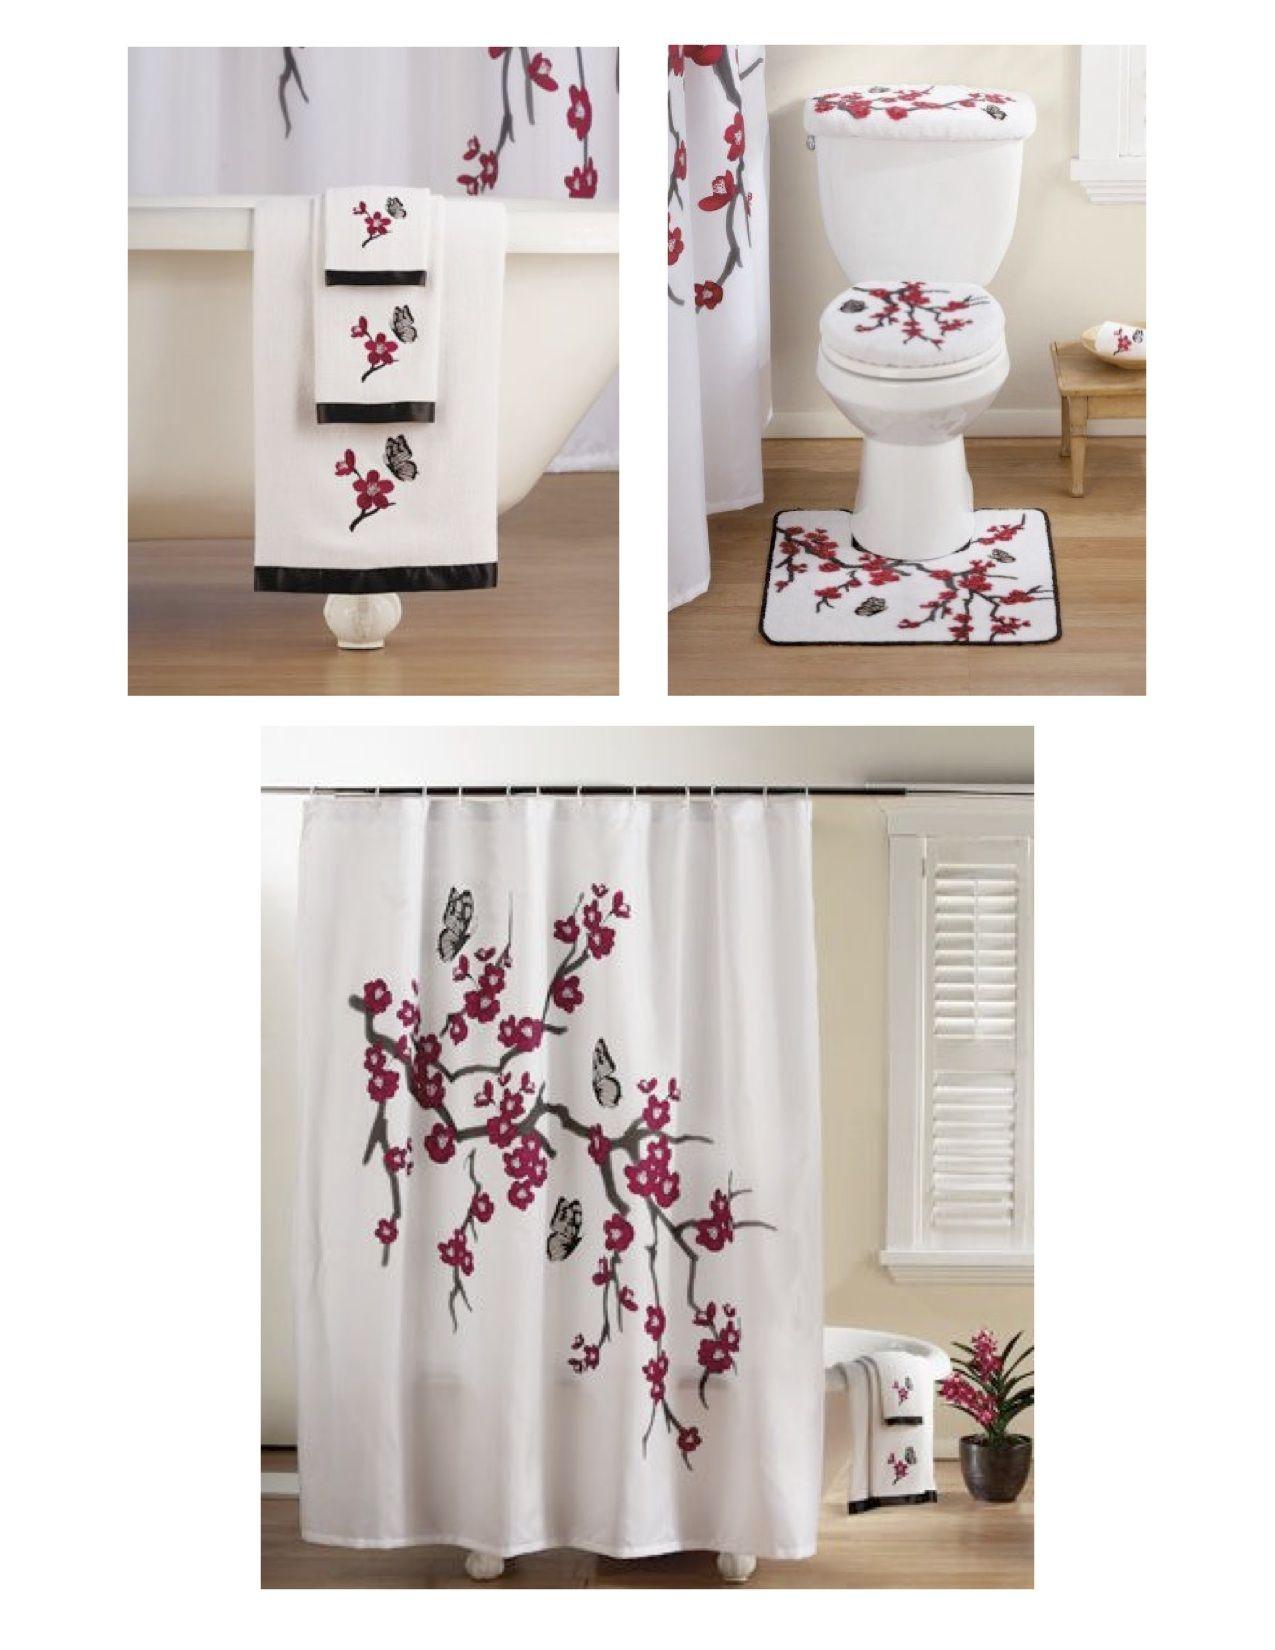 quotAsian CHERRY Blossomquot Bathroom Set Bath Towel Set Towel